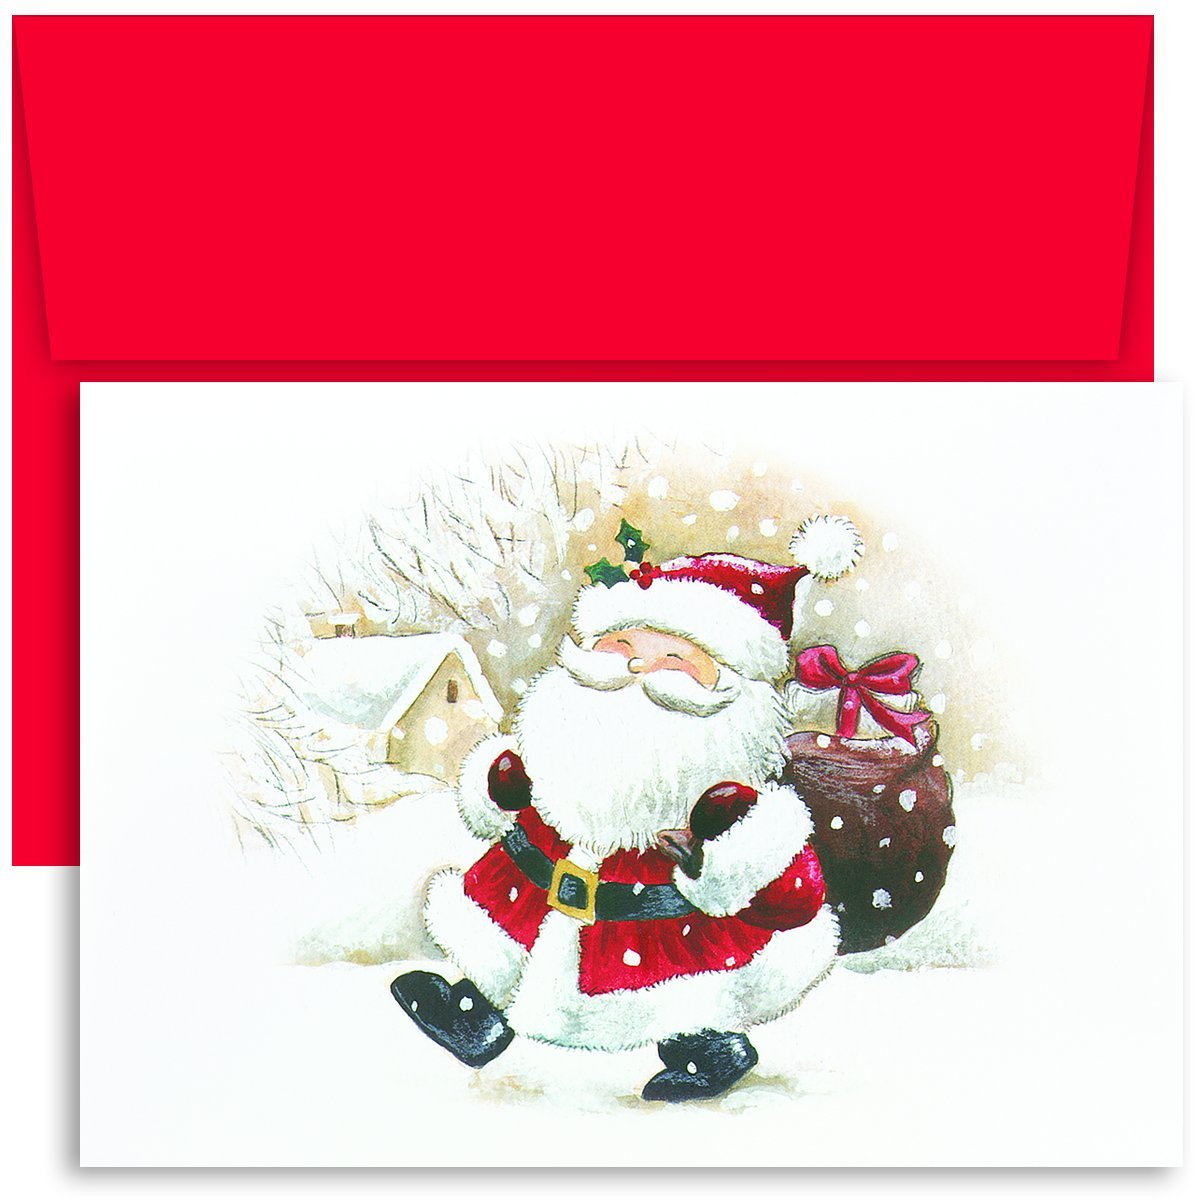 Amazon.com : Masterpiece Studios Holiday Collection 18 Cards / 18 ...